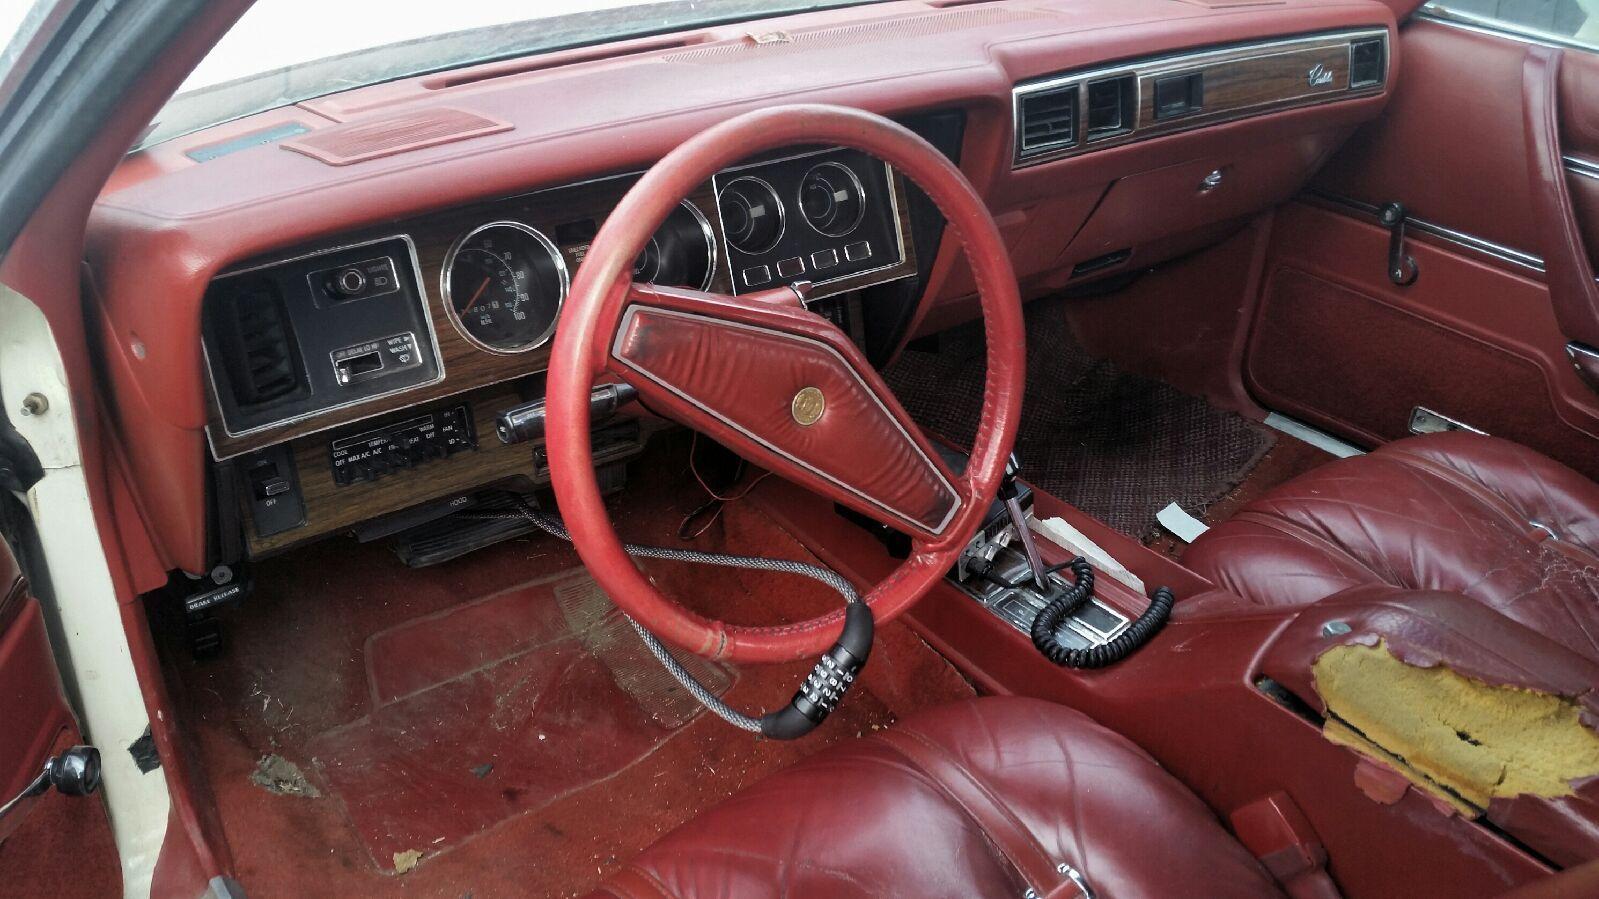 Classic Cars Denver >> 1975 Chrysler Cordoba Base Hardtop 2-Door 5.9L - Classic Chrysler Cordoba 1975 for sale